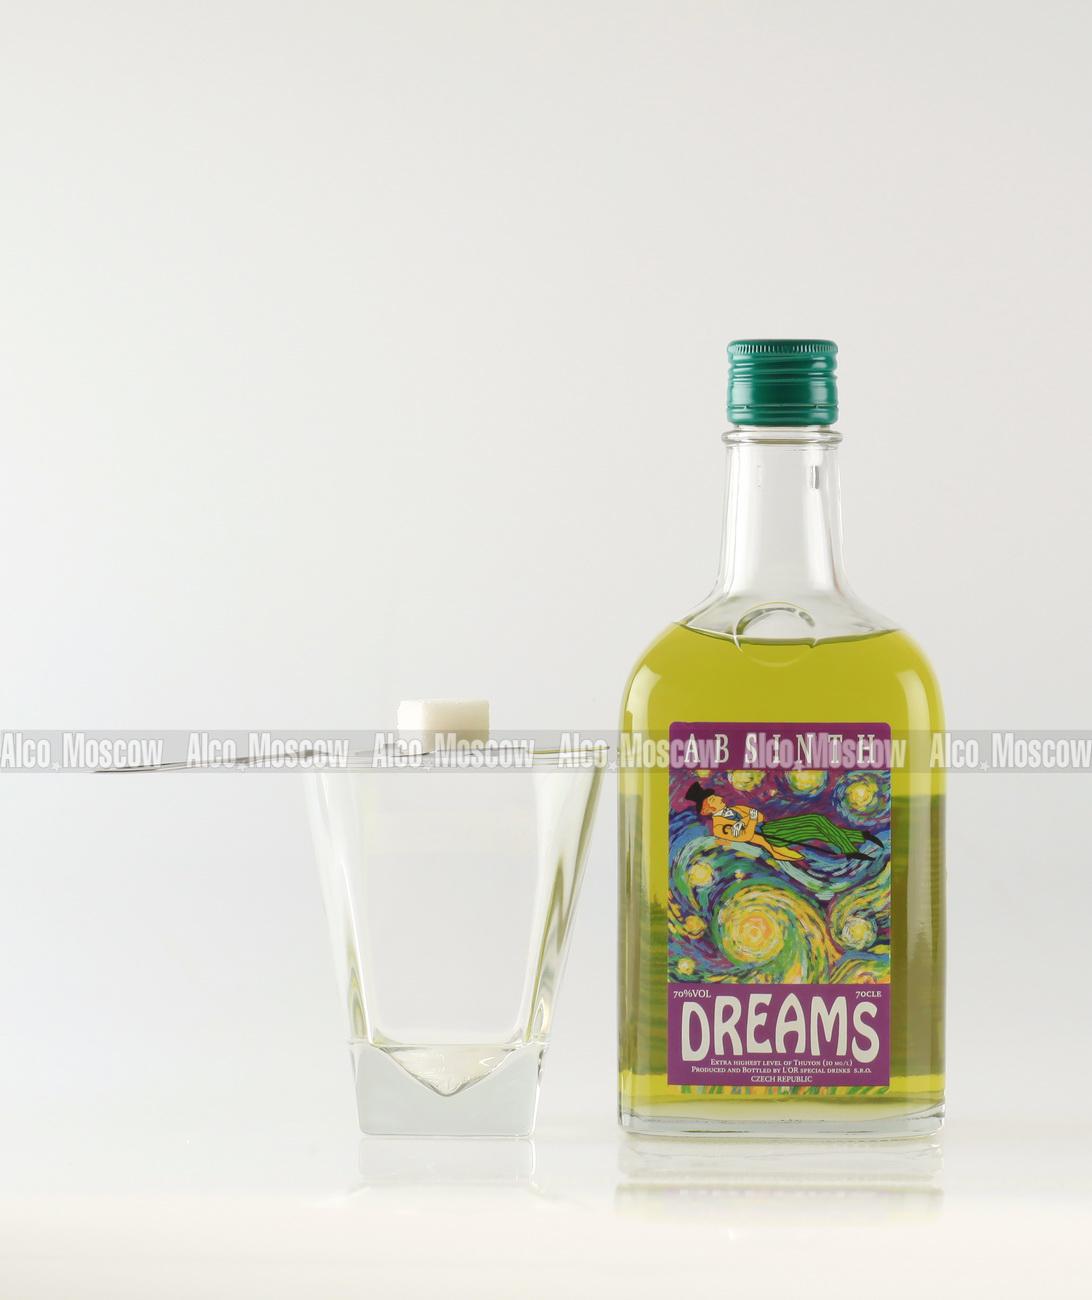 Dreams Dreams Абсент Дримс содержание туйона 10